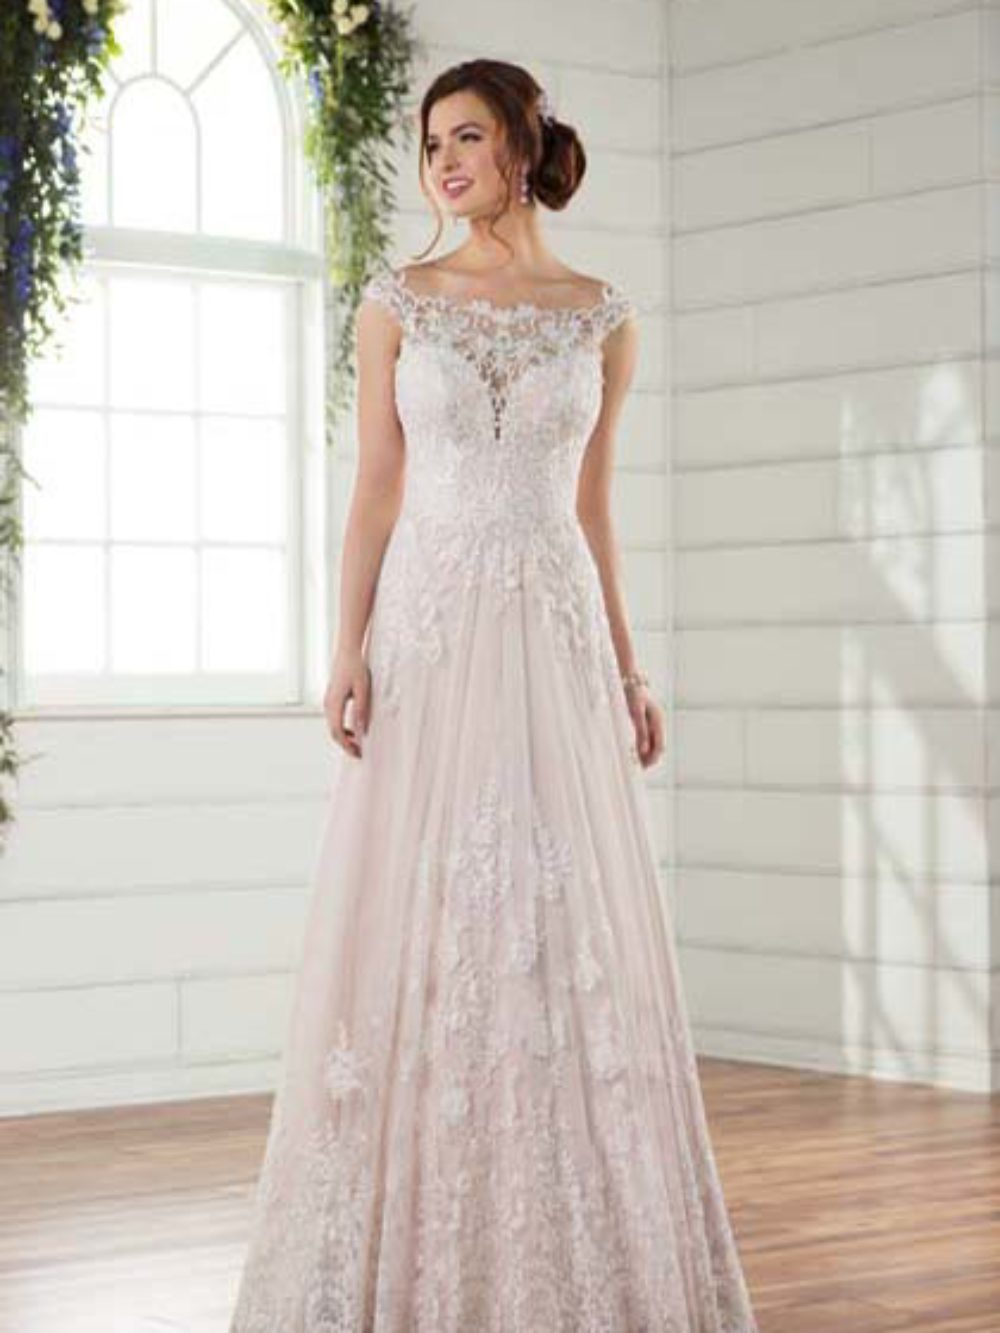 17993a7b87e Maggie Sottero Wedding Dresses from Precious Memories Bridal Shop